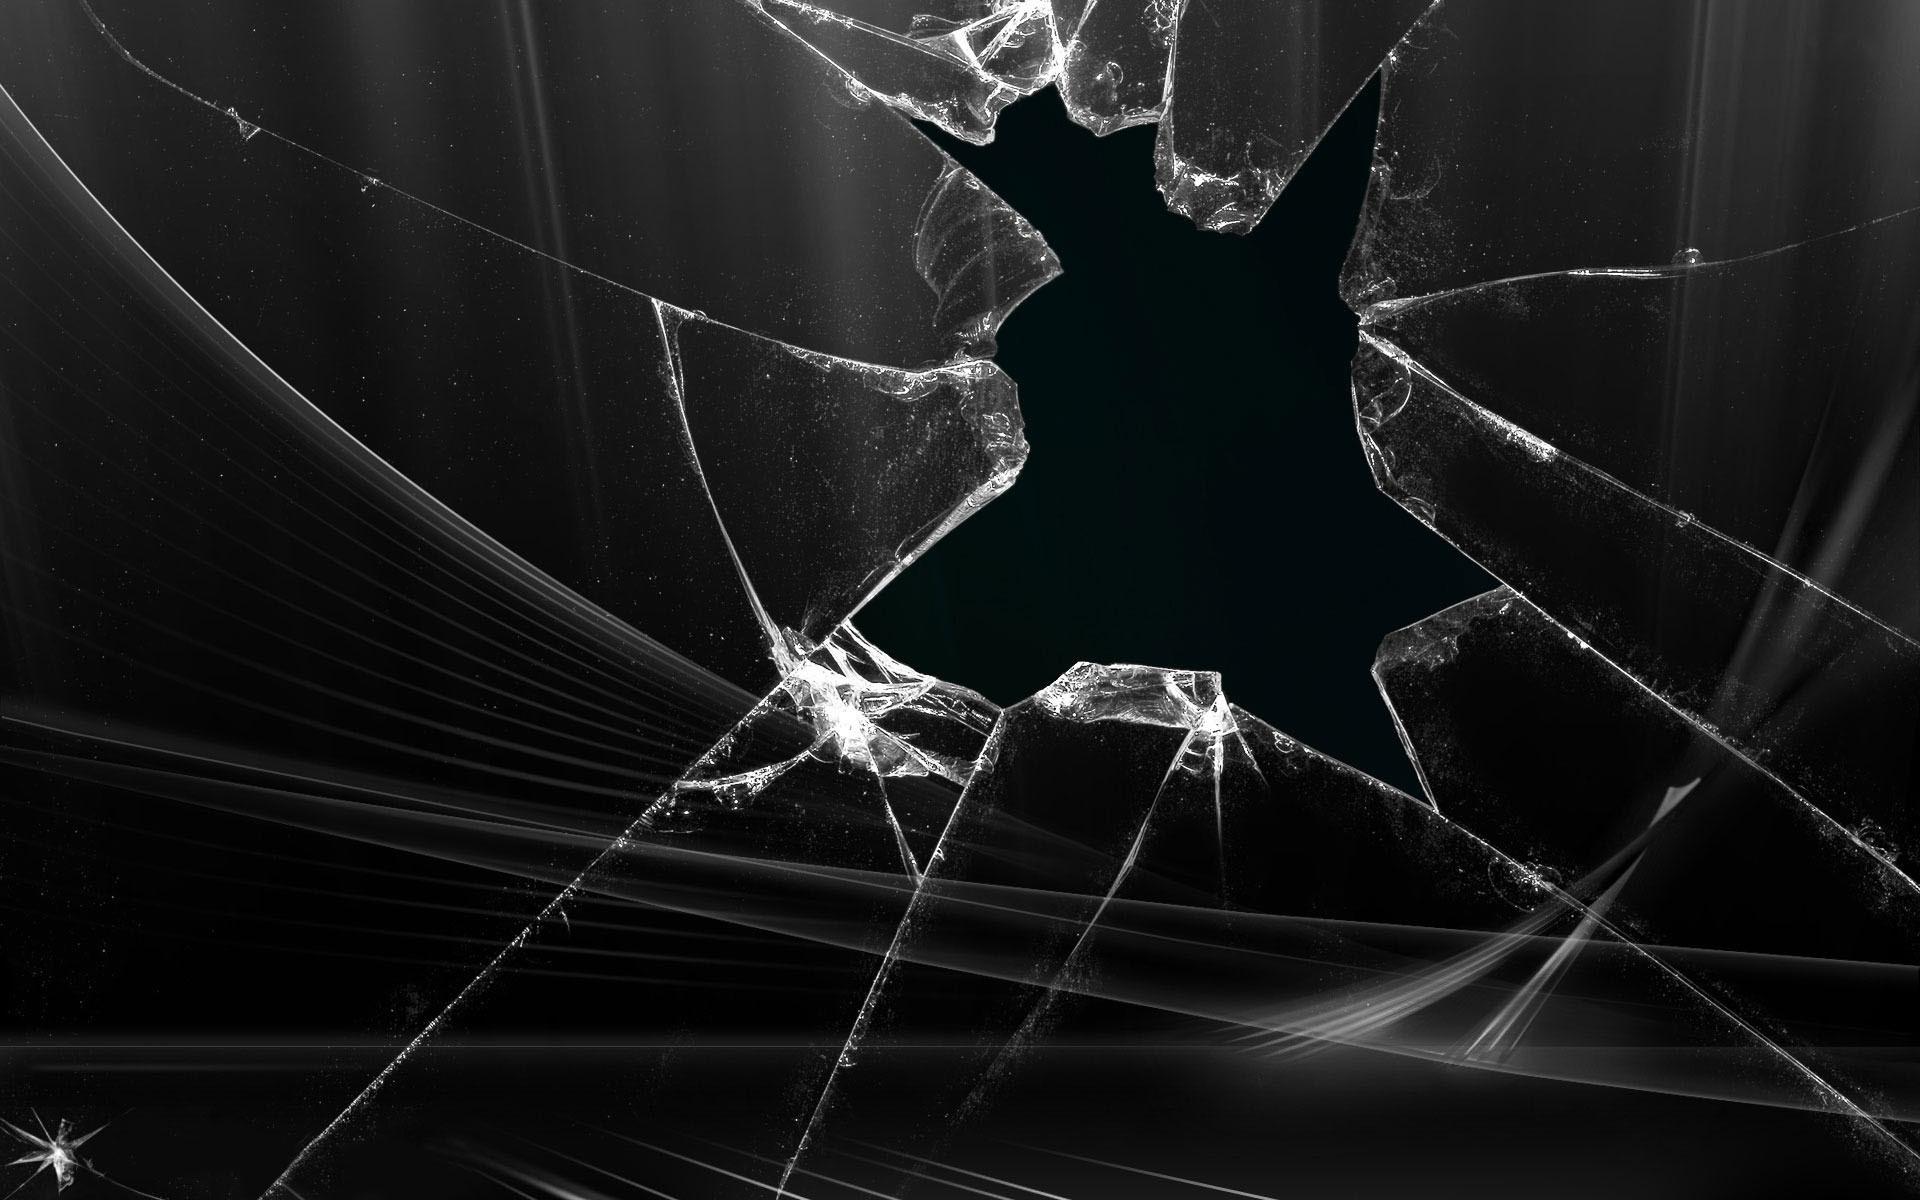 Black Abstract Desktop Images